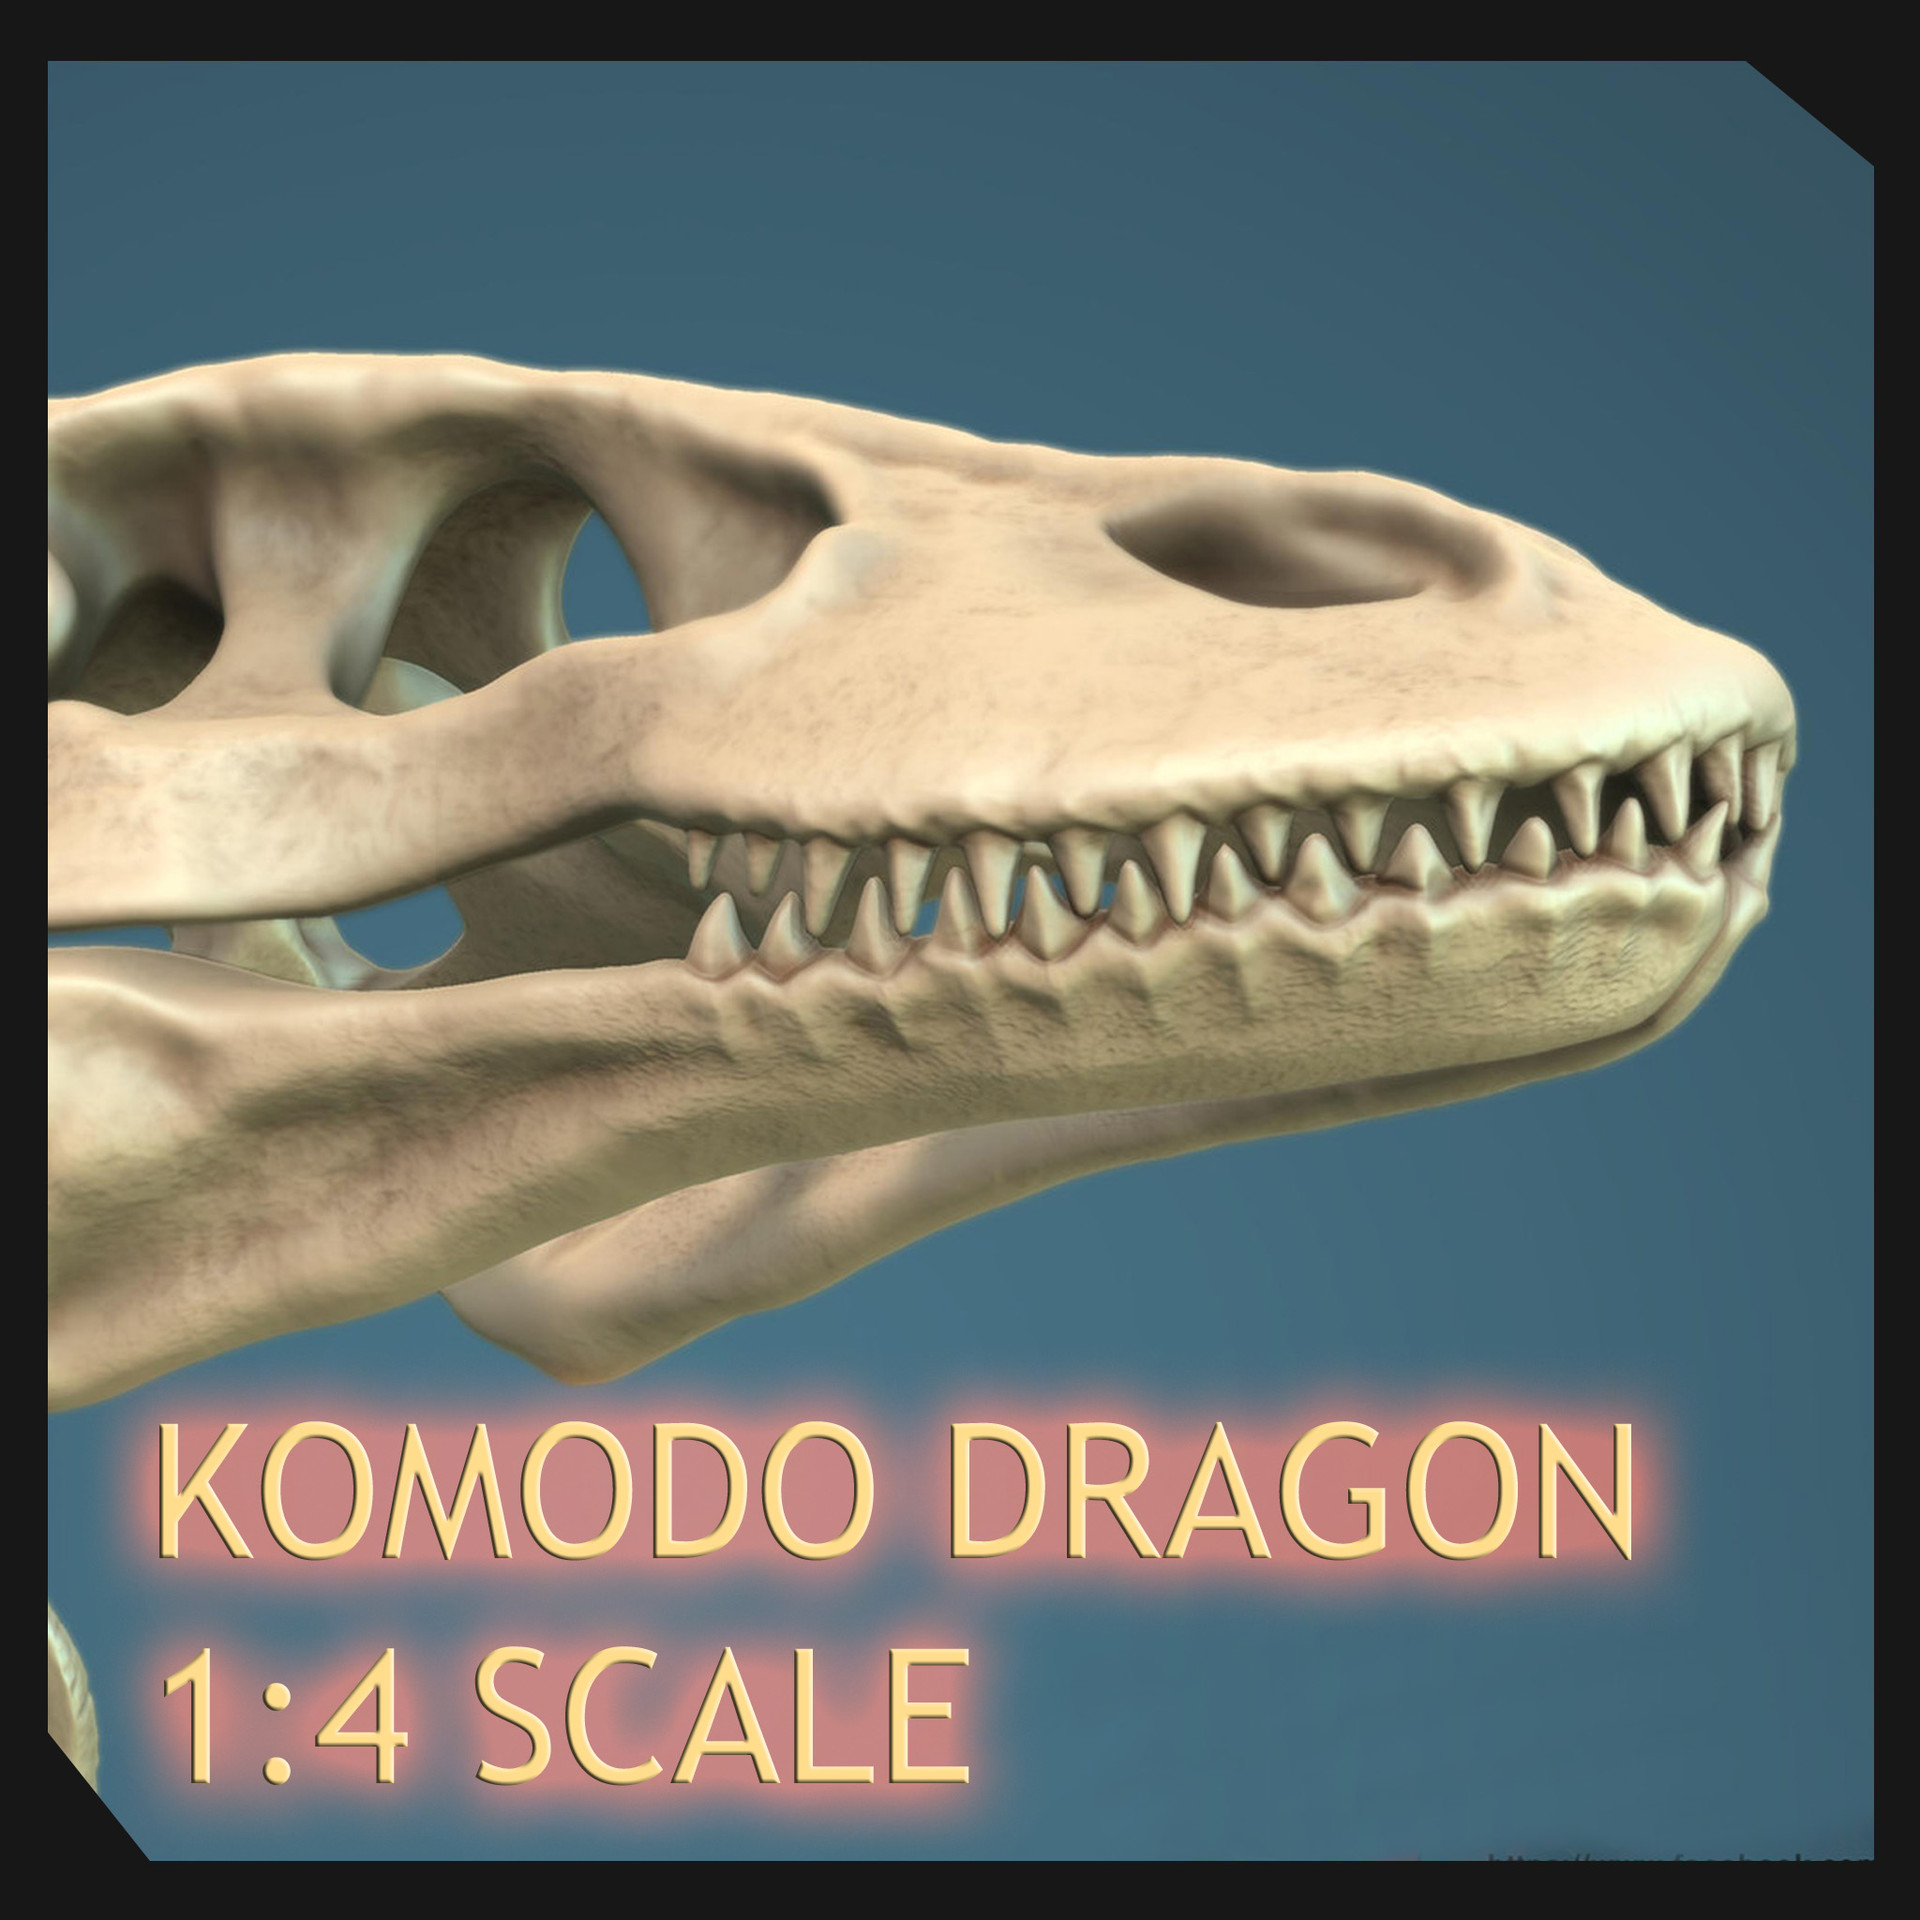 Komodo Dragon Skeleton By Sergio Mengual